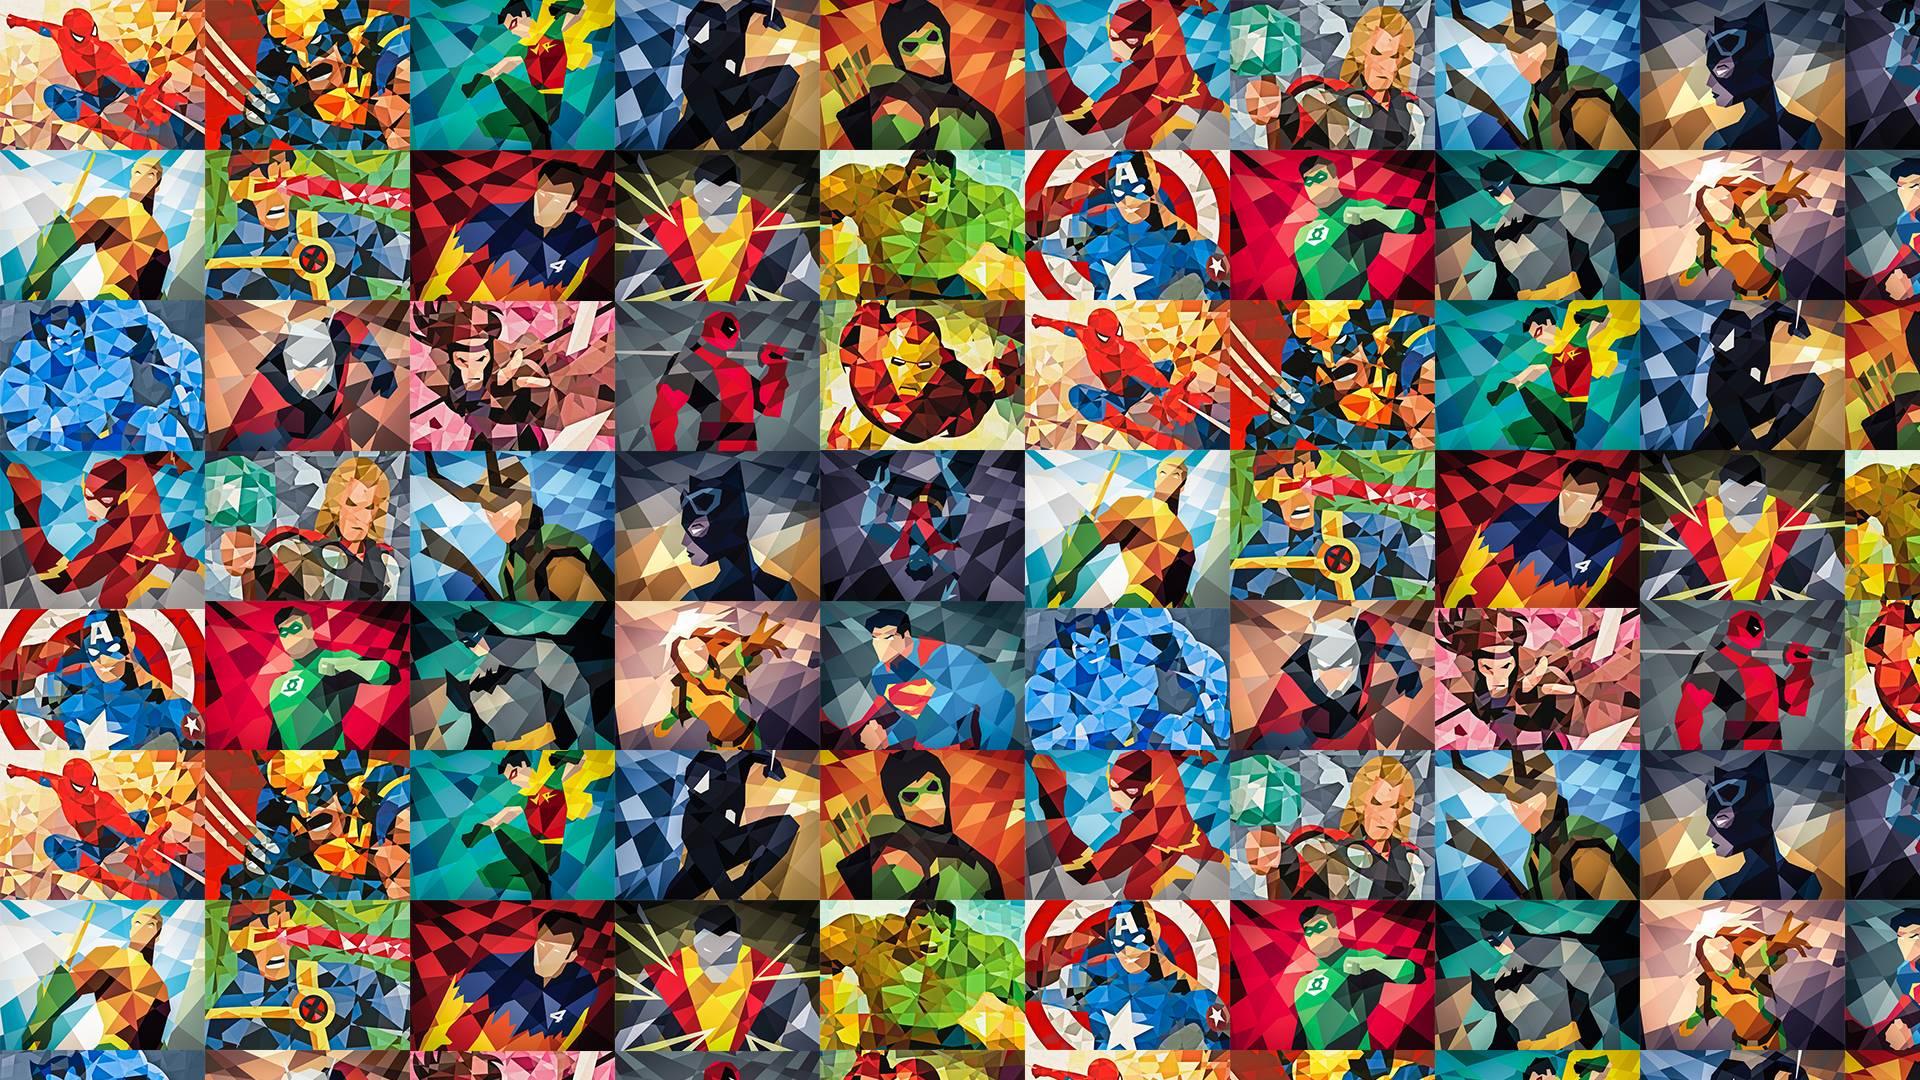 Amazing Wallpaper Marvel Vintage - KMO2Lg  Pictures_572434.jpg